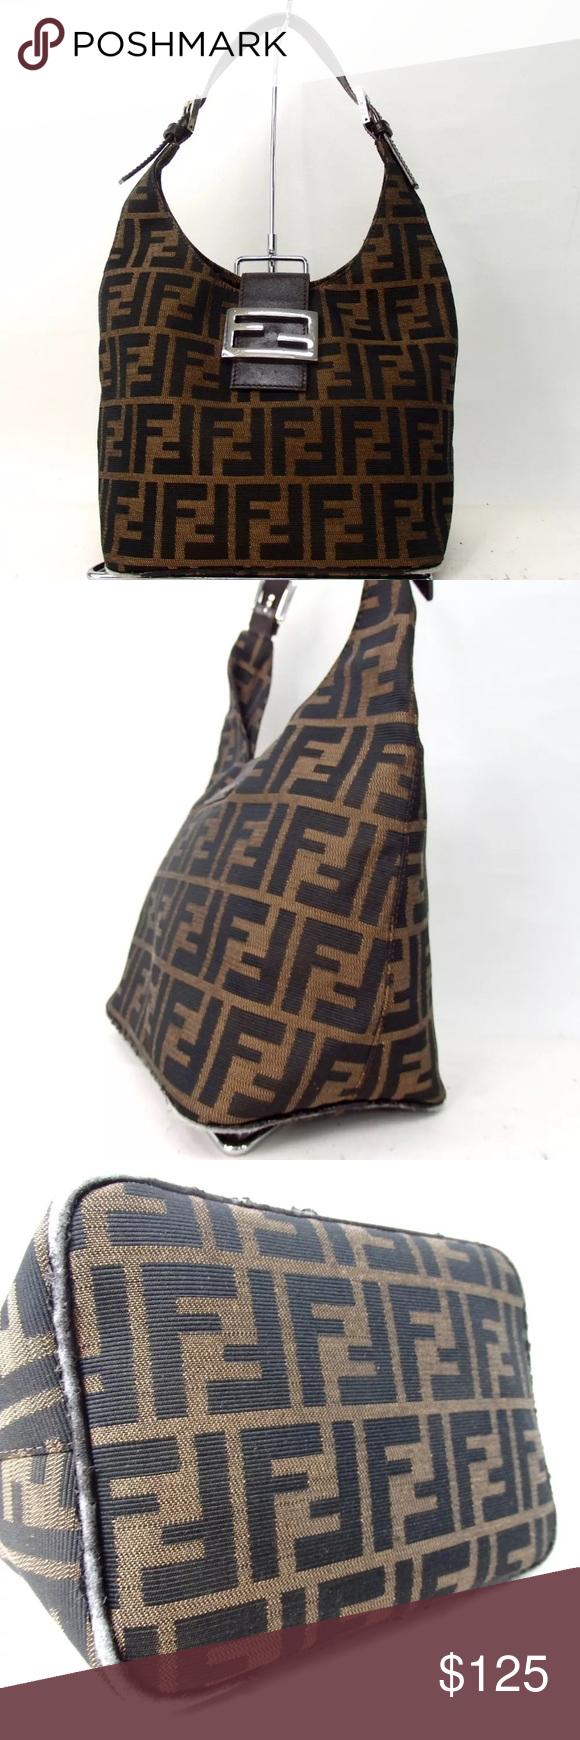 ... huge discount 0f39d 7081f Vintage fendi handbag Authentic Vintage handbag  Fendi Bags ... 23409a0999